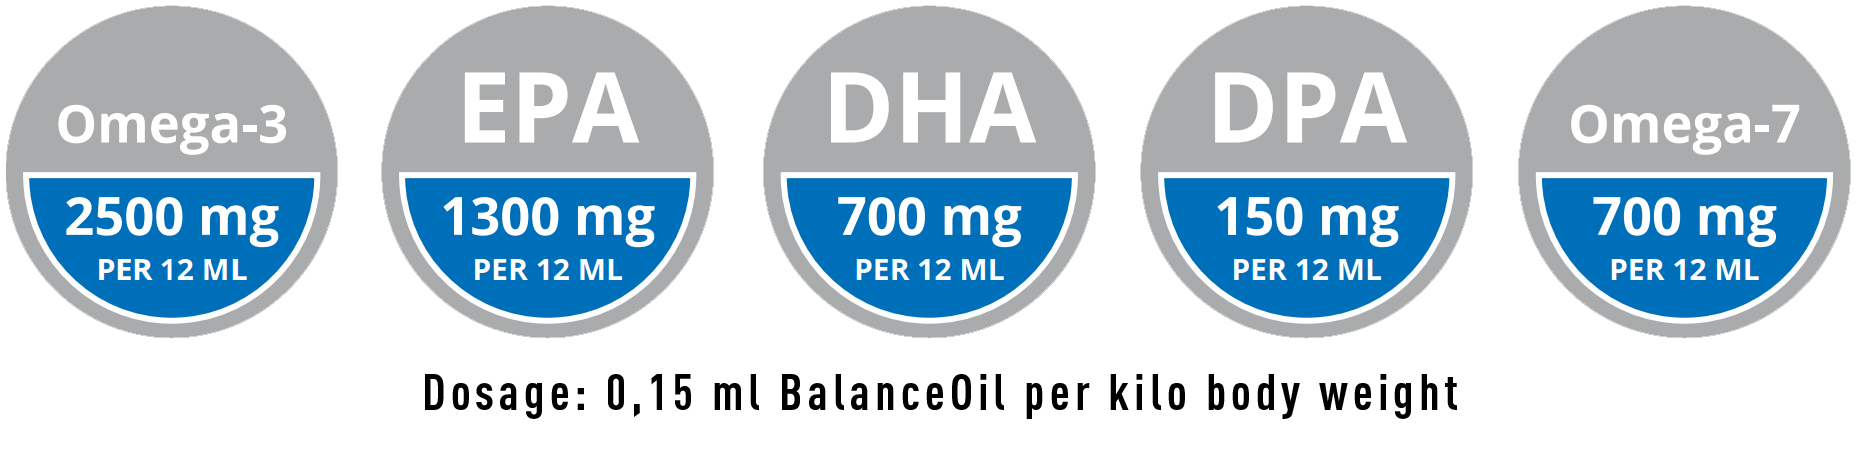 Zinzino BalanceOil - Omega3, EPA, DHA, DPA, Omega7 Ratio